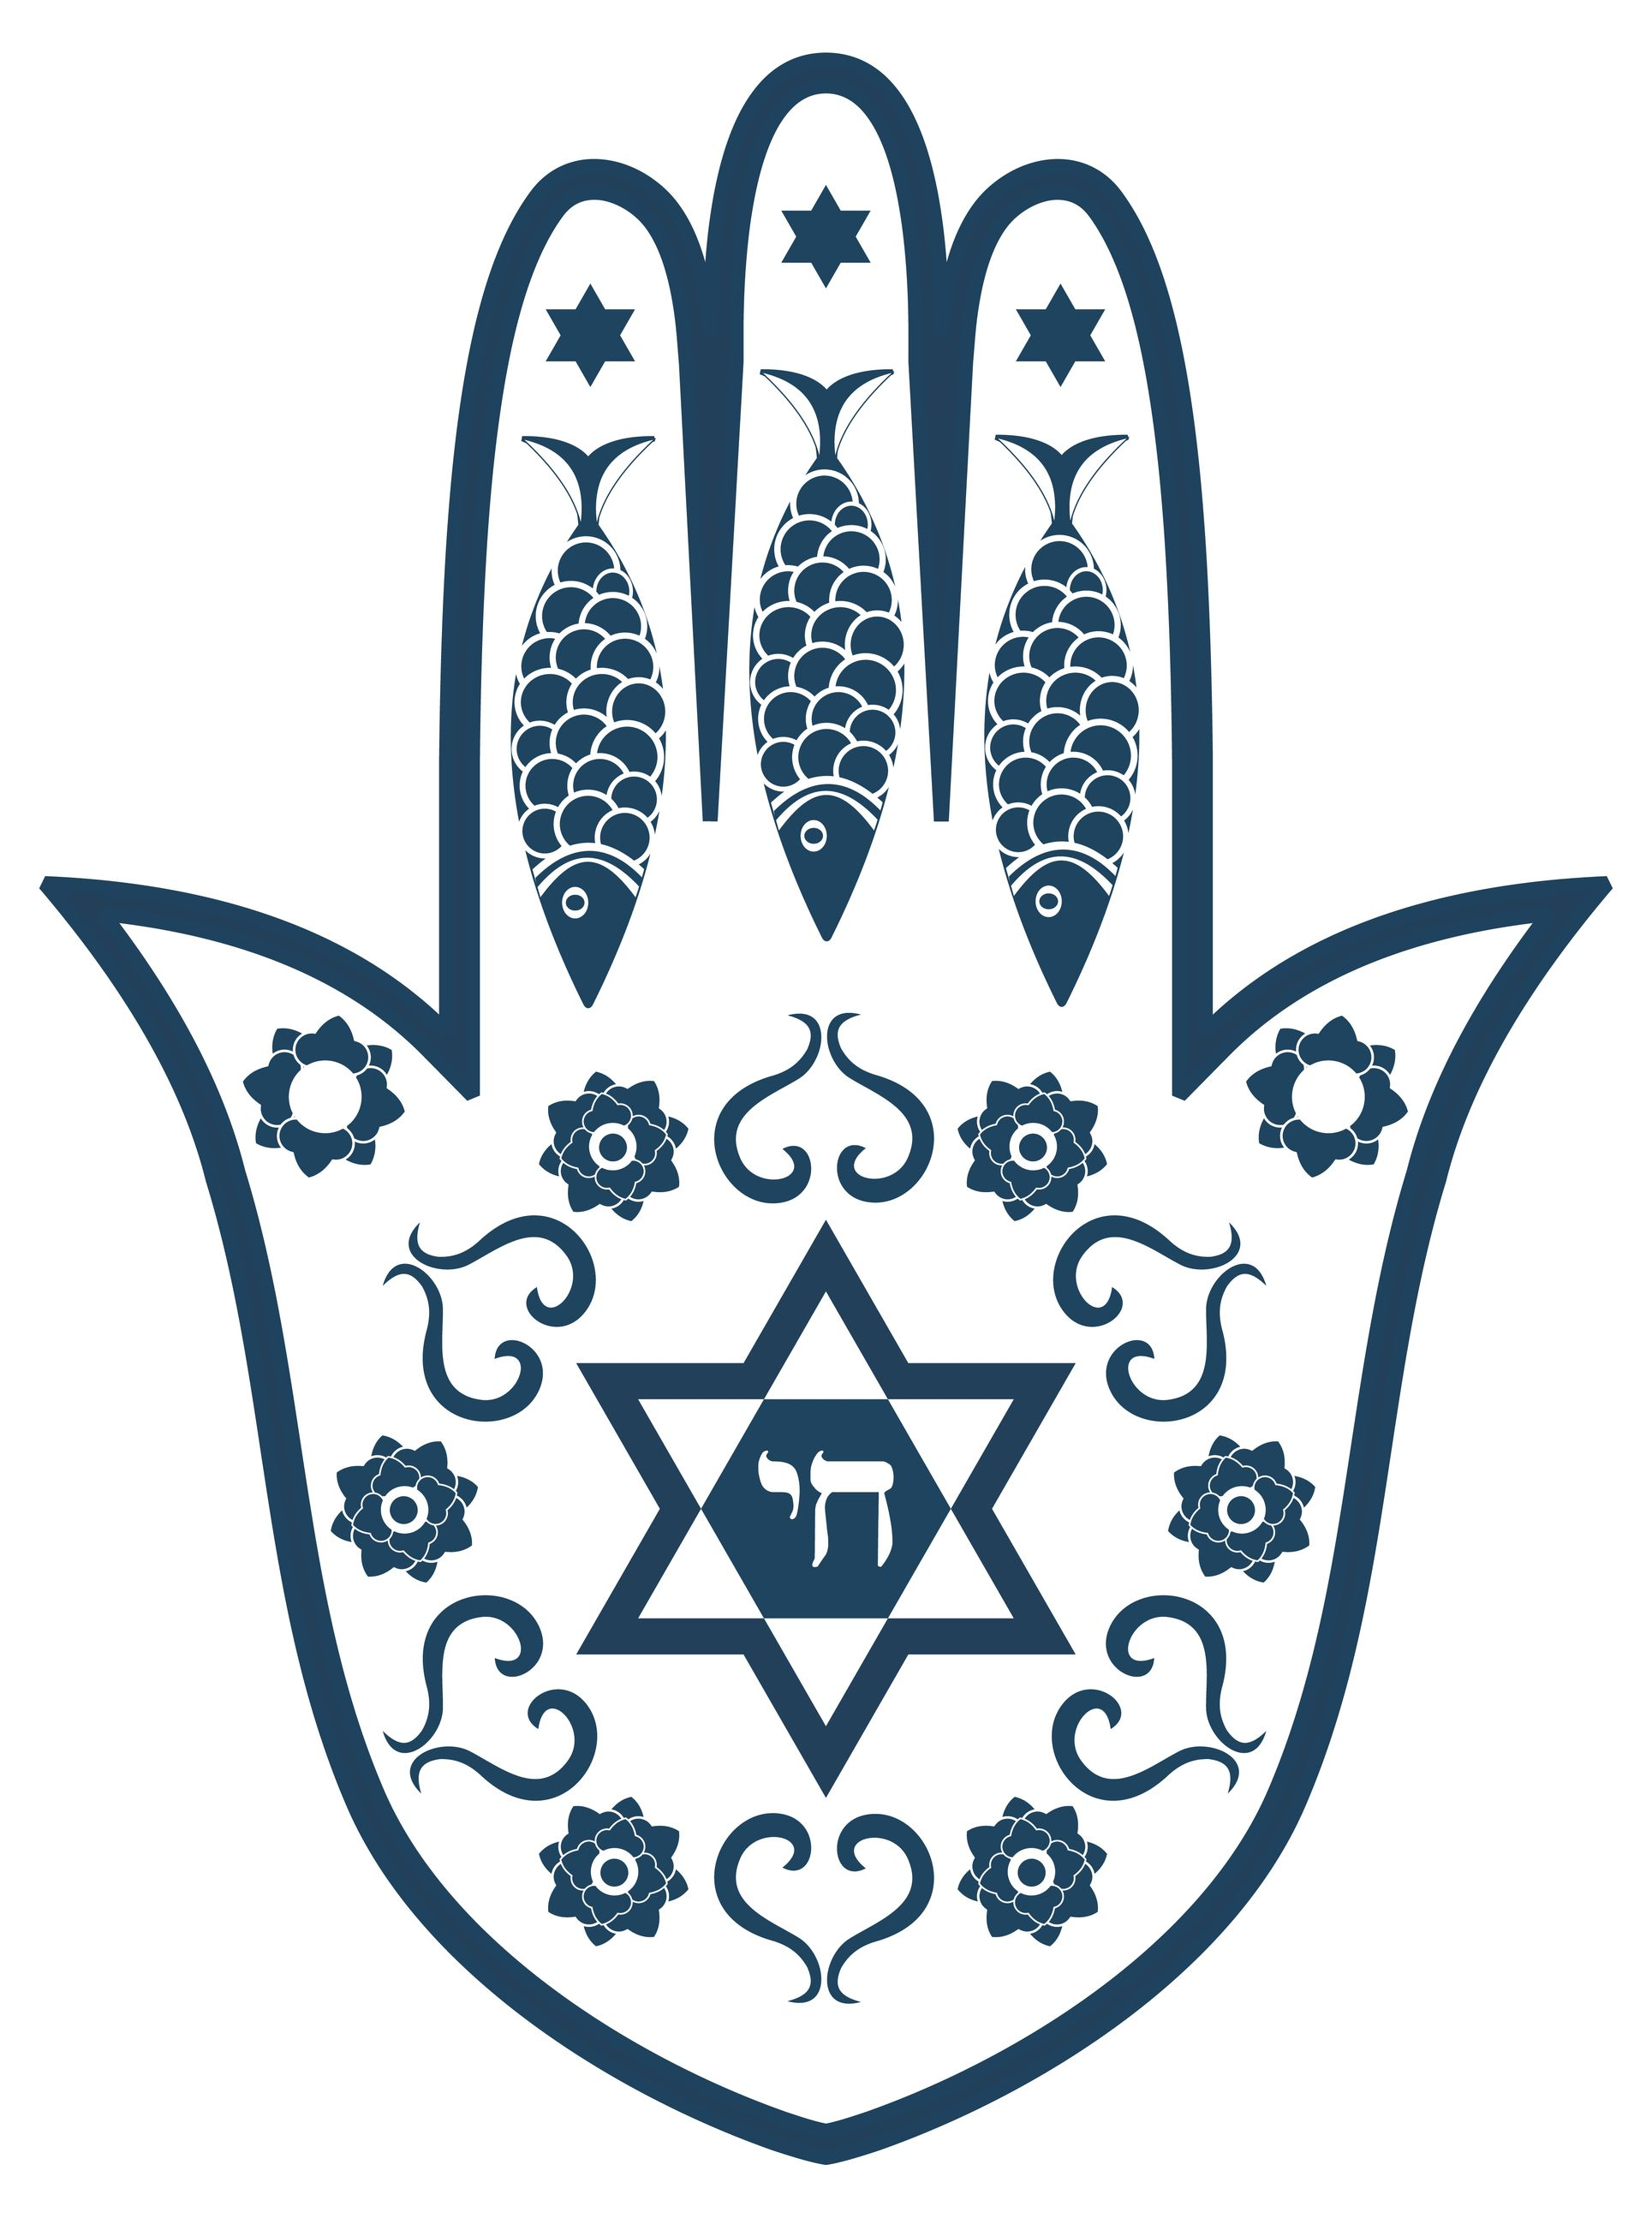 Hamsa hand tattoo designs for har shalom pinterest hamsa jewish sacred amulet hamsa or miriam hand royalty free stock images image 17680059 biocorpaavc